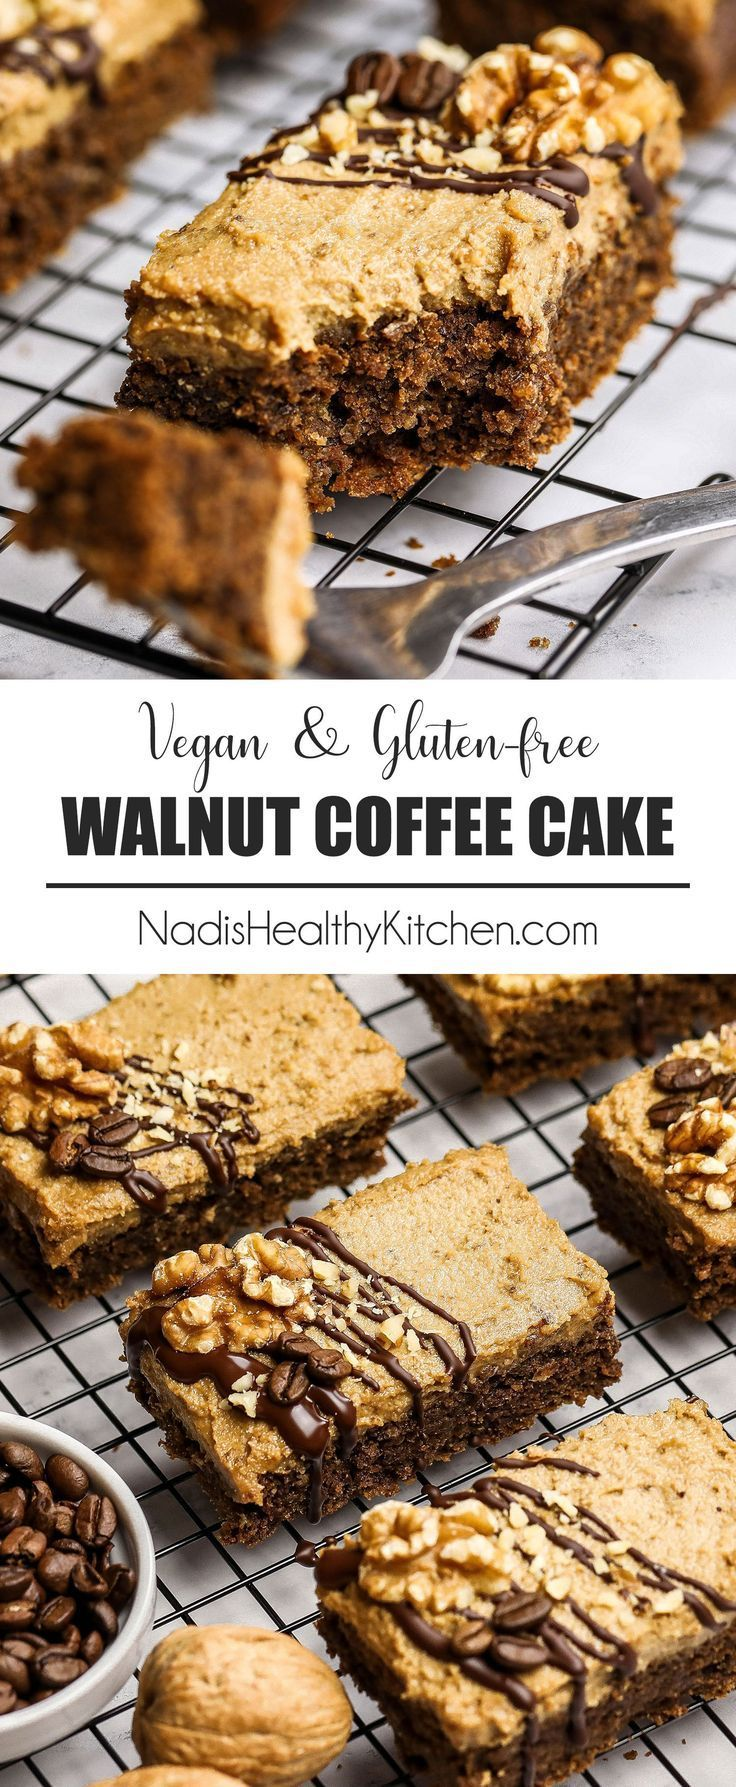 California Walnut Coffee Cake Bars - UK Health Blog - Nadia's Healthy Kitchen